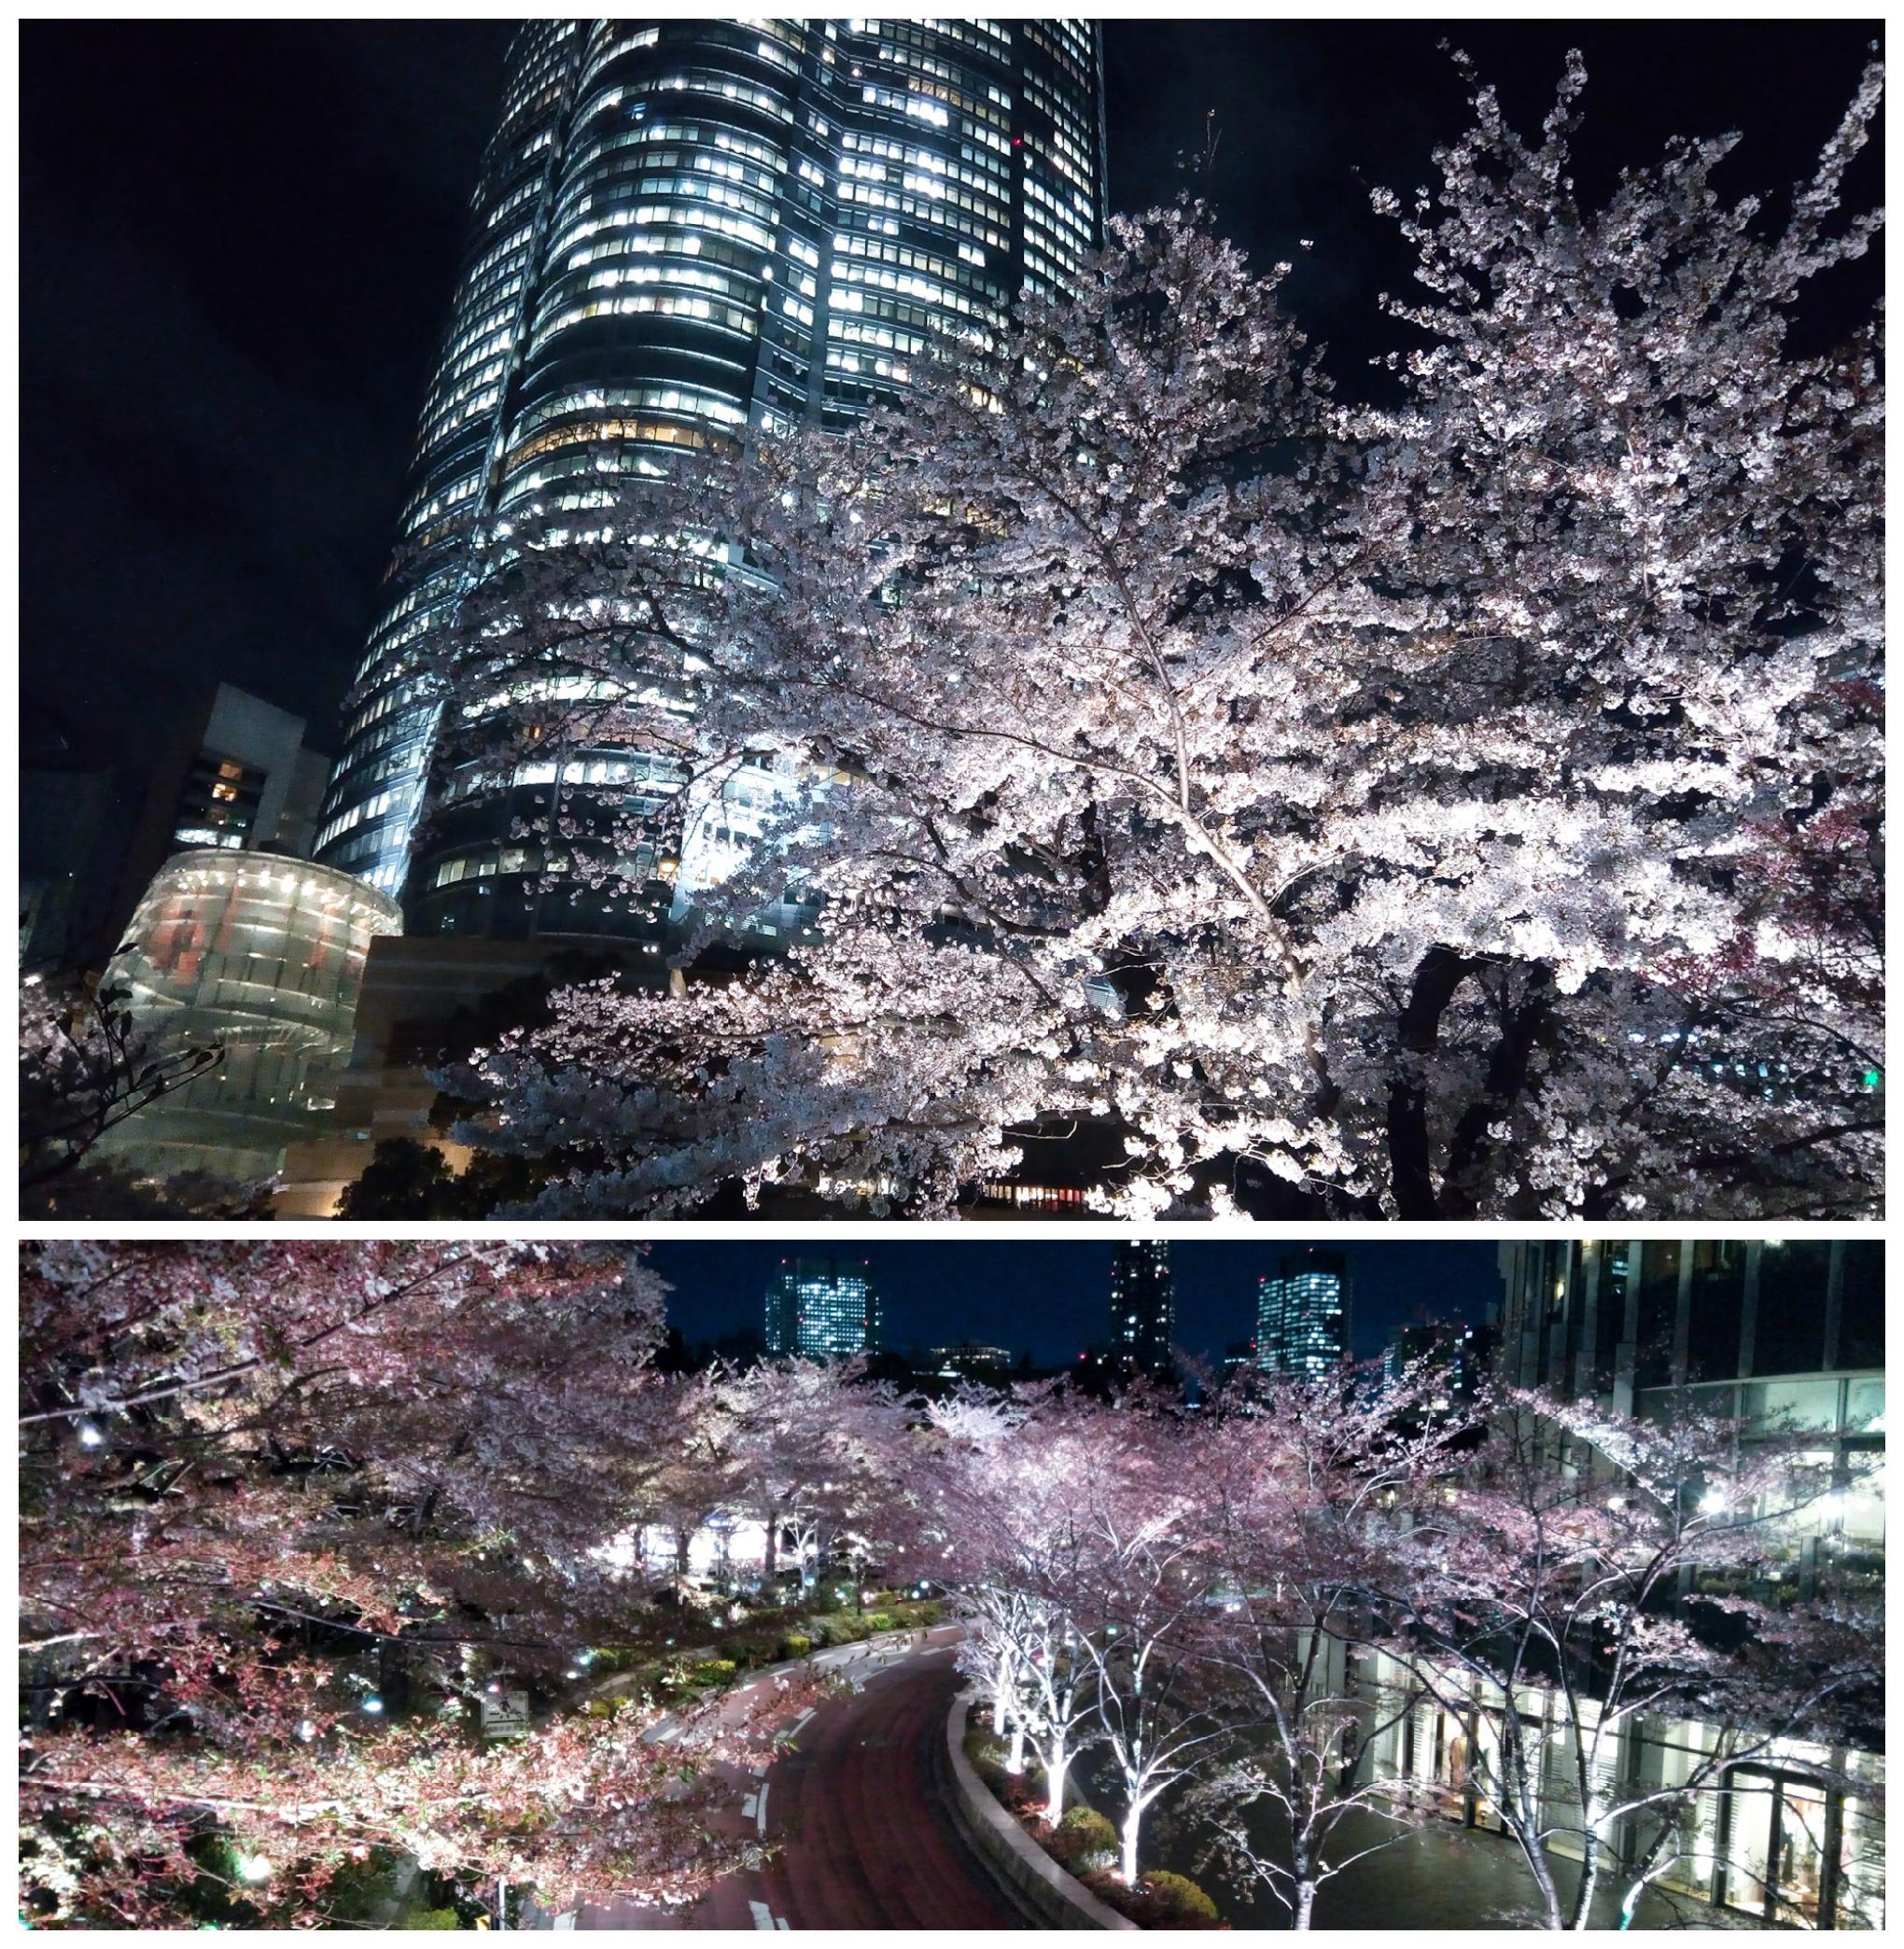 Urban photos - Chuo Ward, Osaka, Japan. 'Tokyo Midtown and Mori Gardens Roppongi.' Sakura Japan doesn't end when the sun goes down. sketchbookexplorer.com @davidasutton @sketchbookexplorer Facebook.com/davidanthonysutton #japan #tokyomidtown #morigardenstokyo #tokyo #travel #travelblog #photography #cheeryblossom #cherryblossomseason